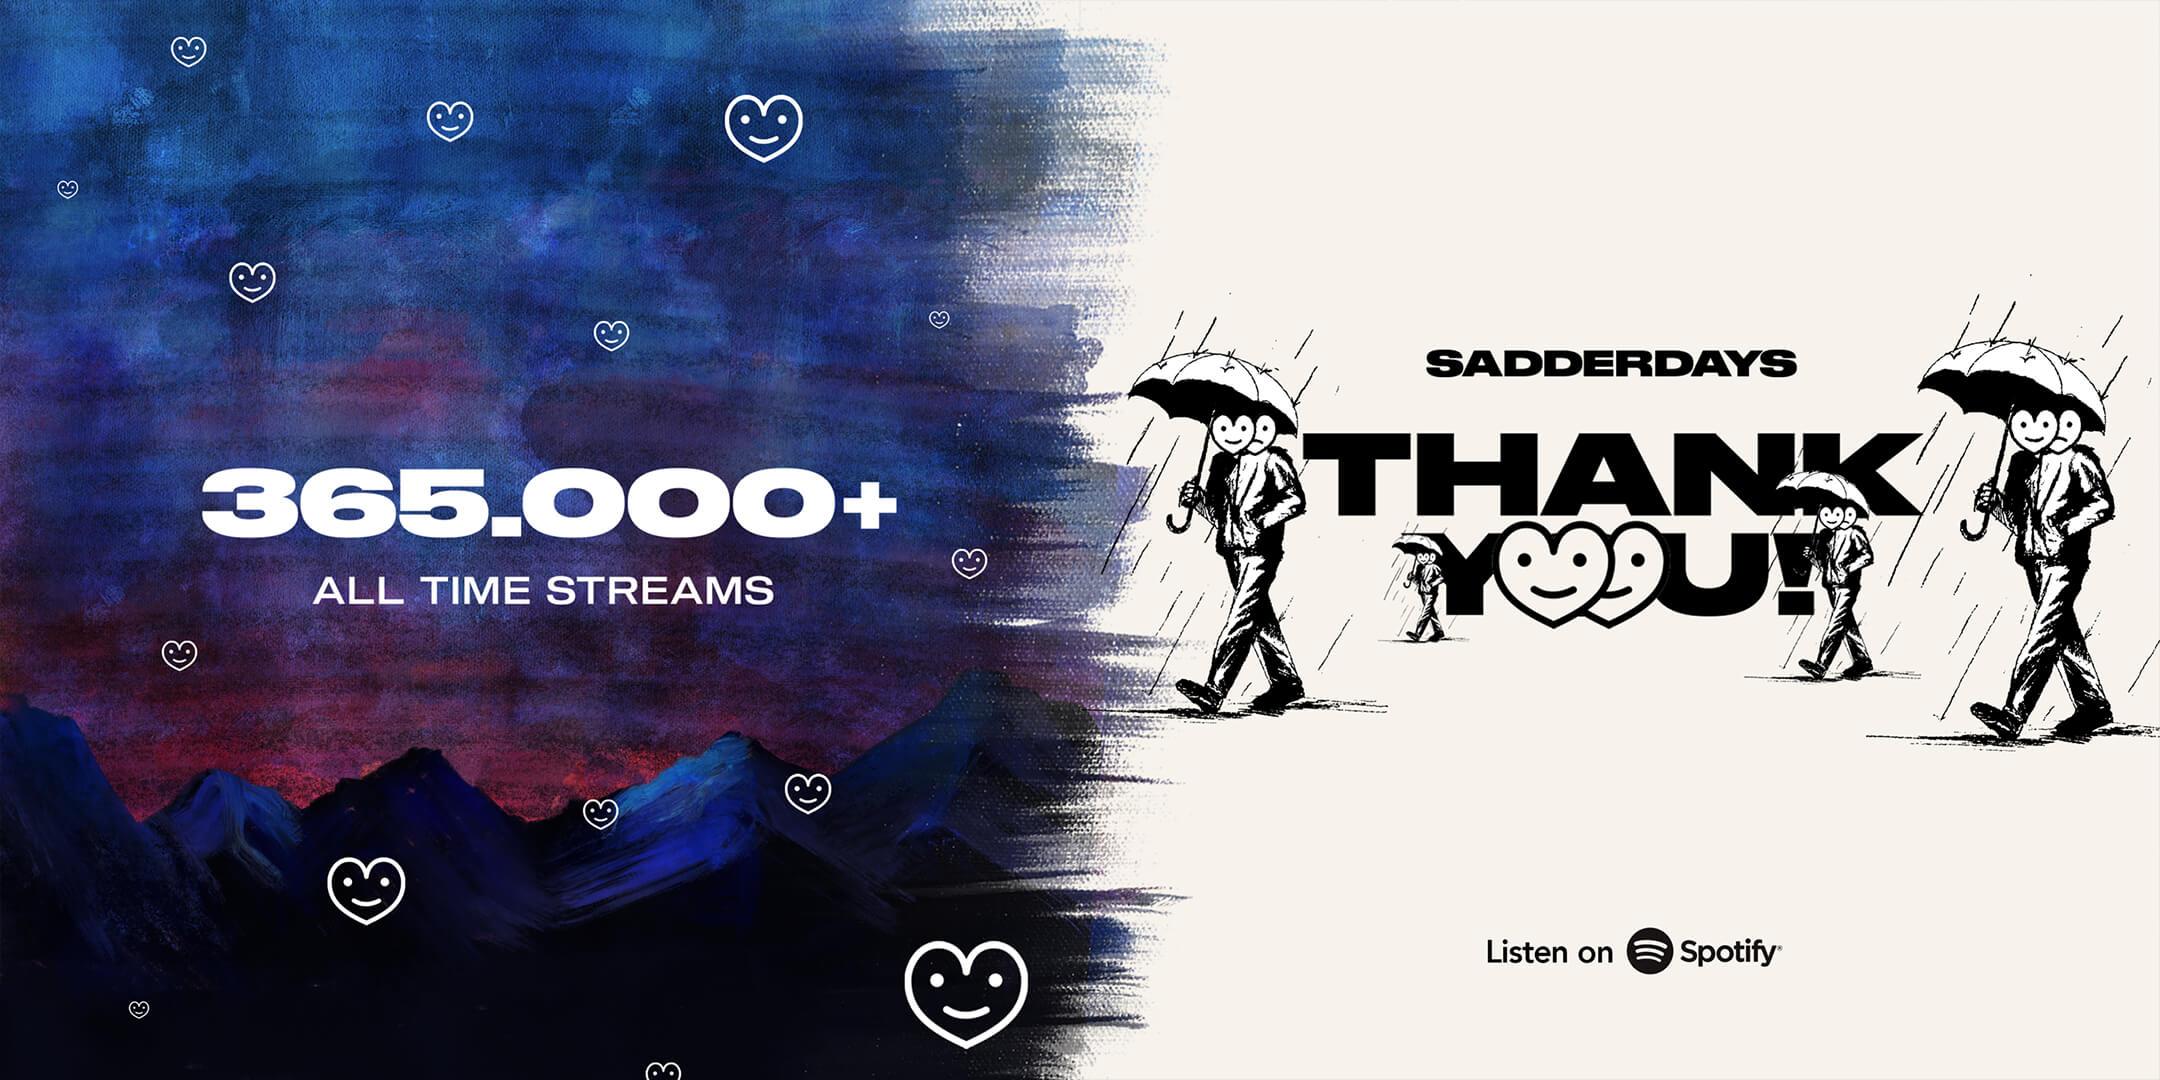 RCN_32-Sadderdays-Yves_Spot3